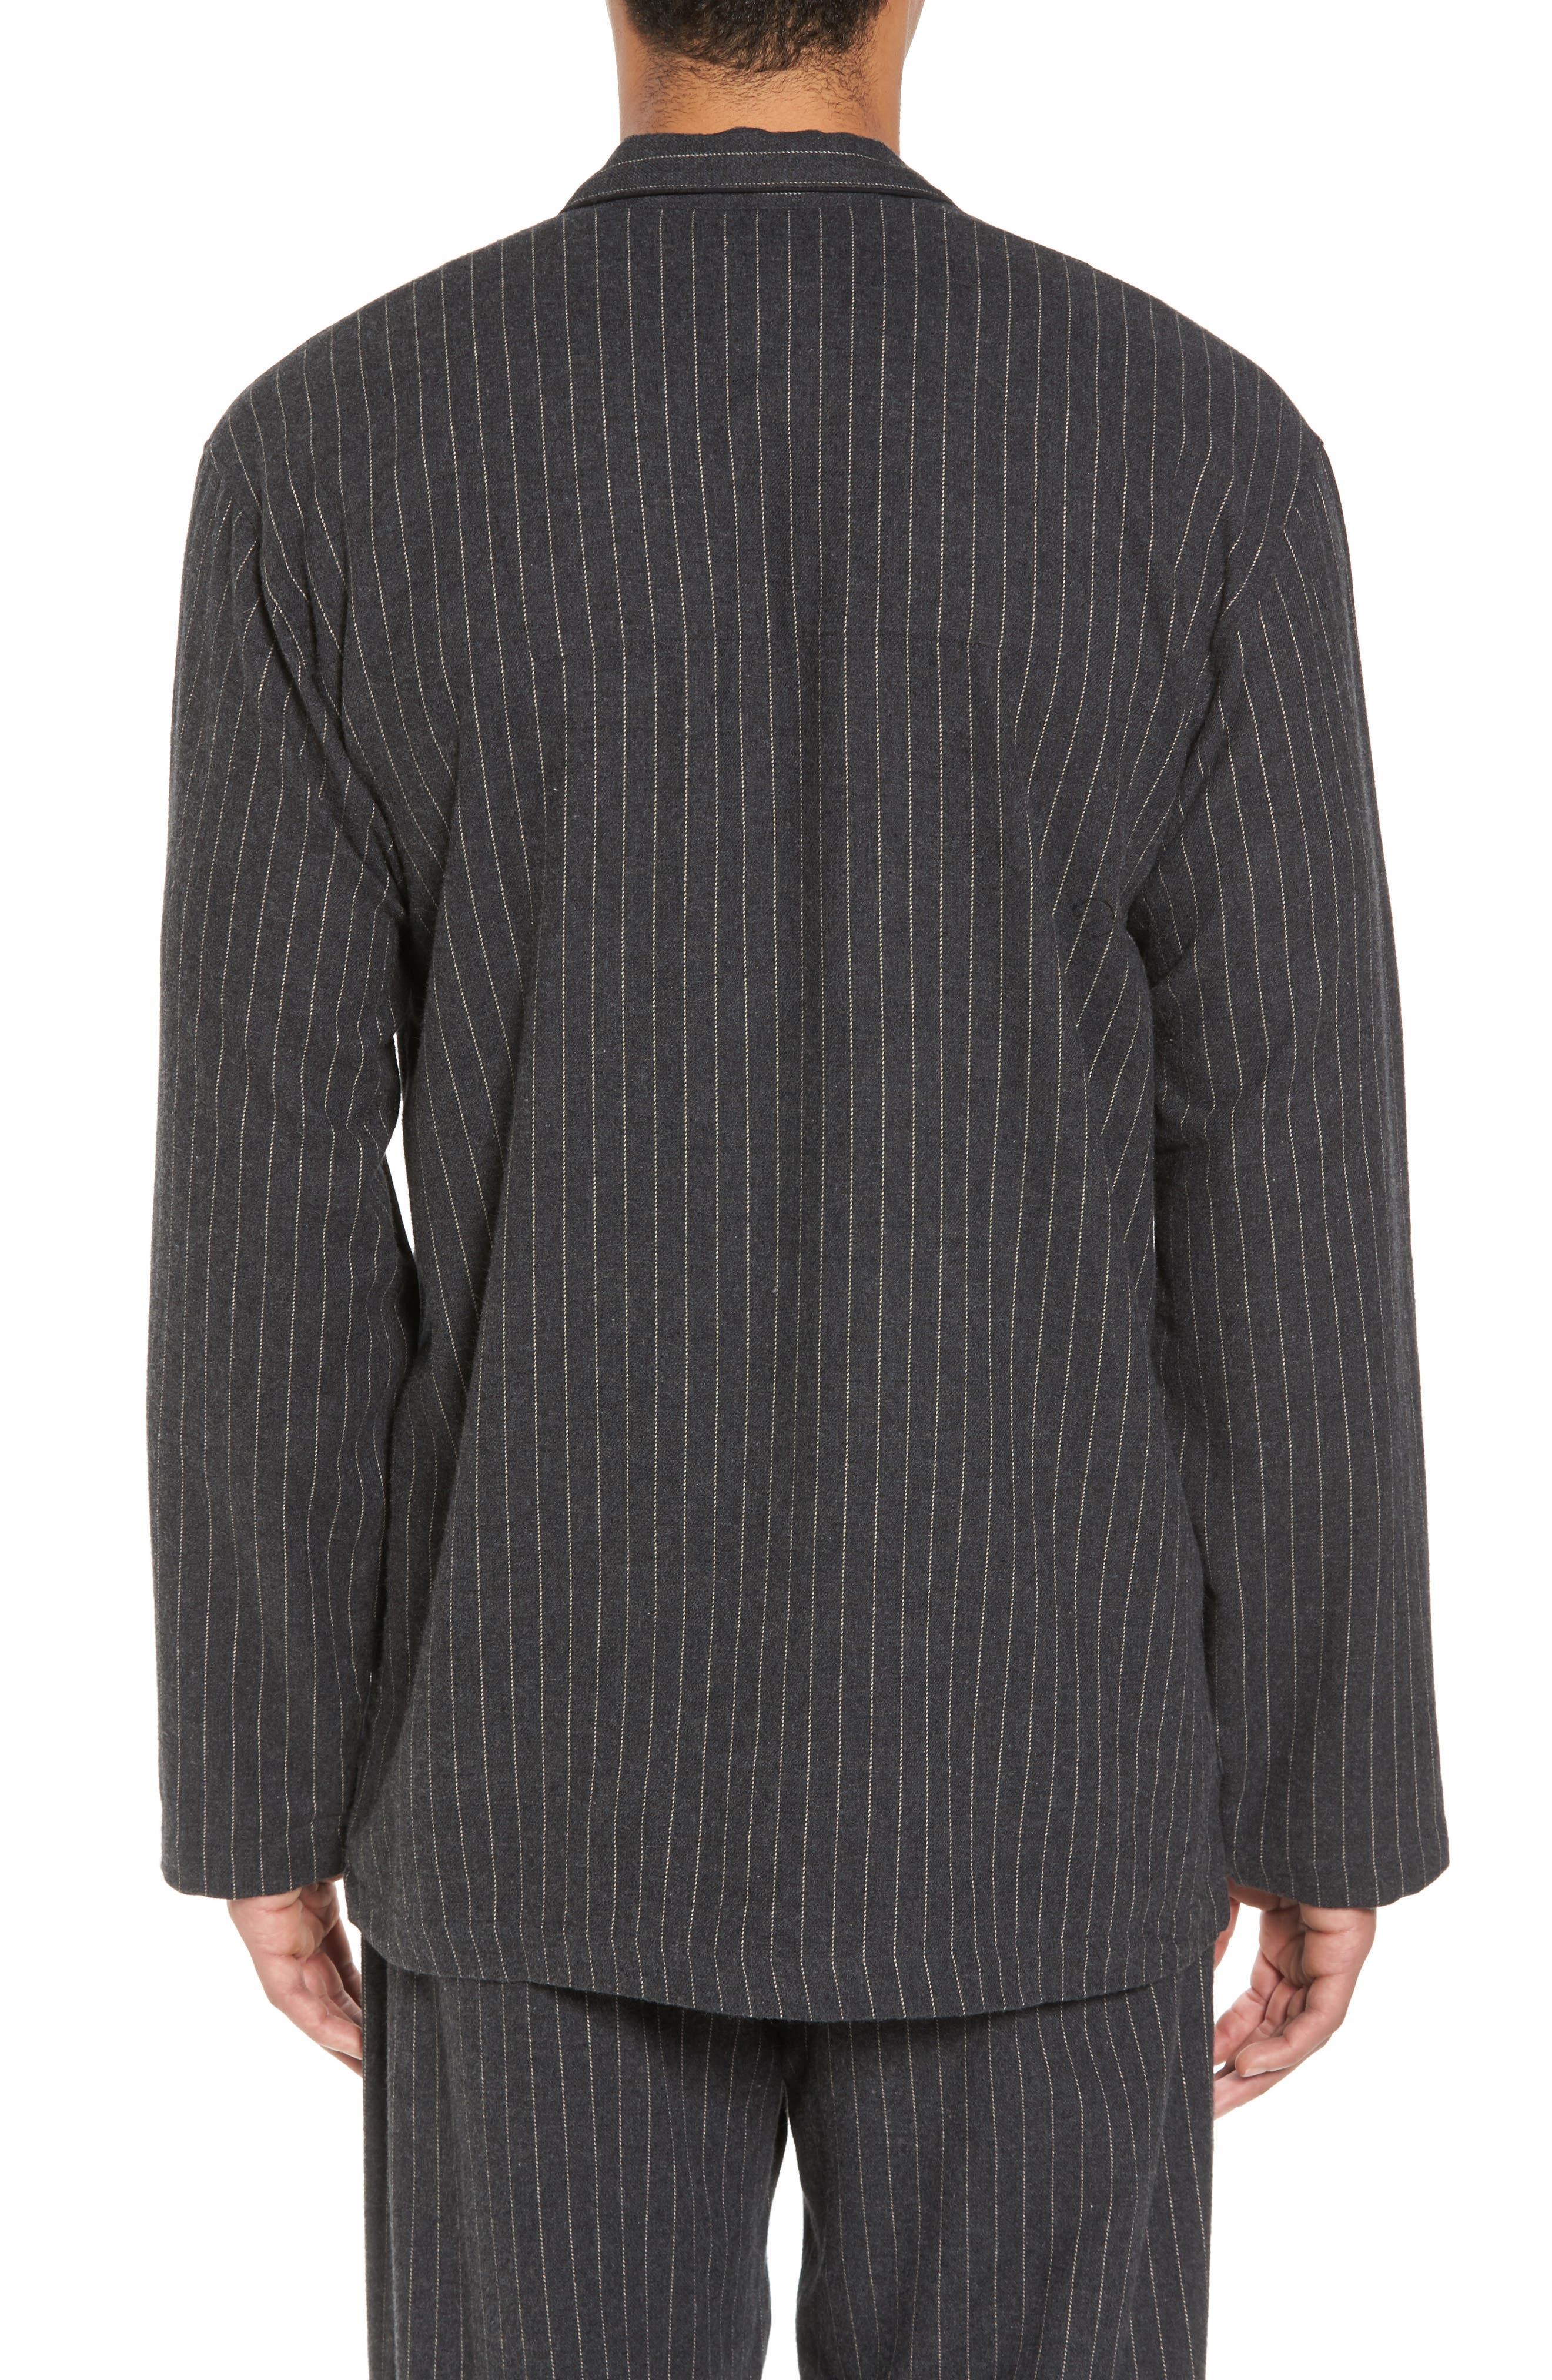 Polo Ralph Lauren Flannel Pajama Shirt,                             Alternate thumbnail 2, color,                             027